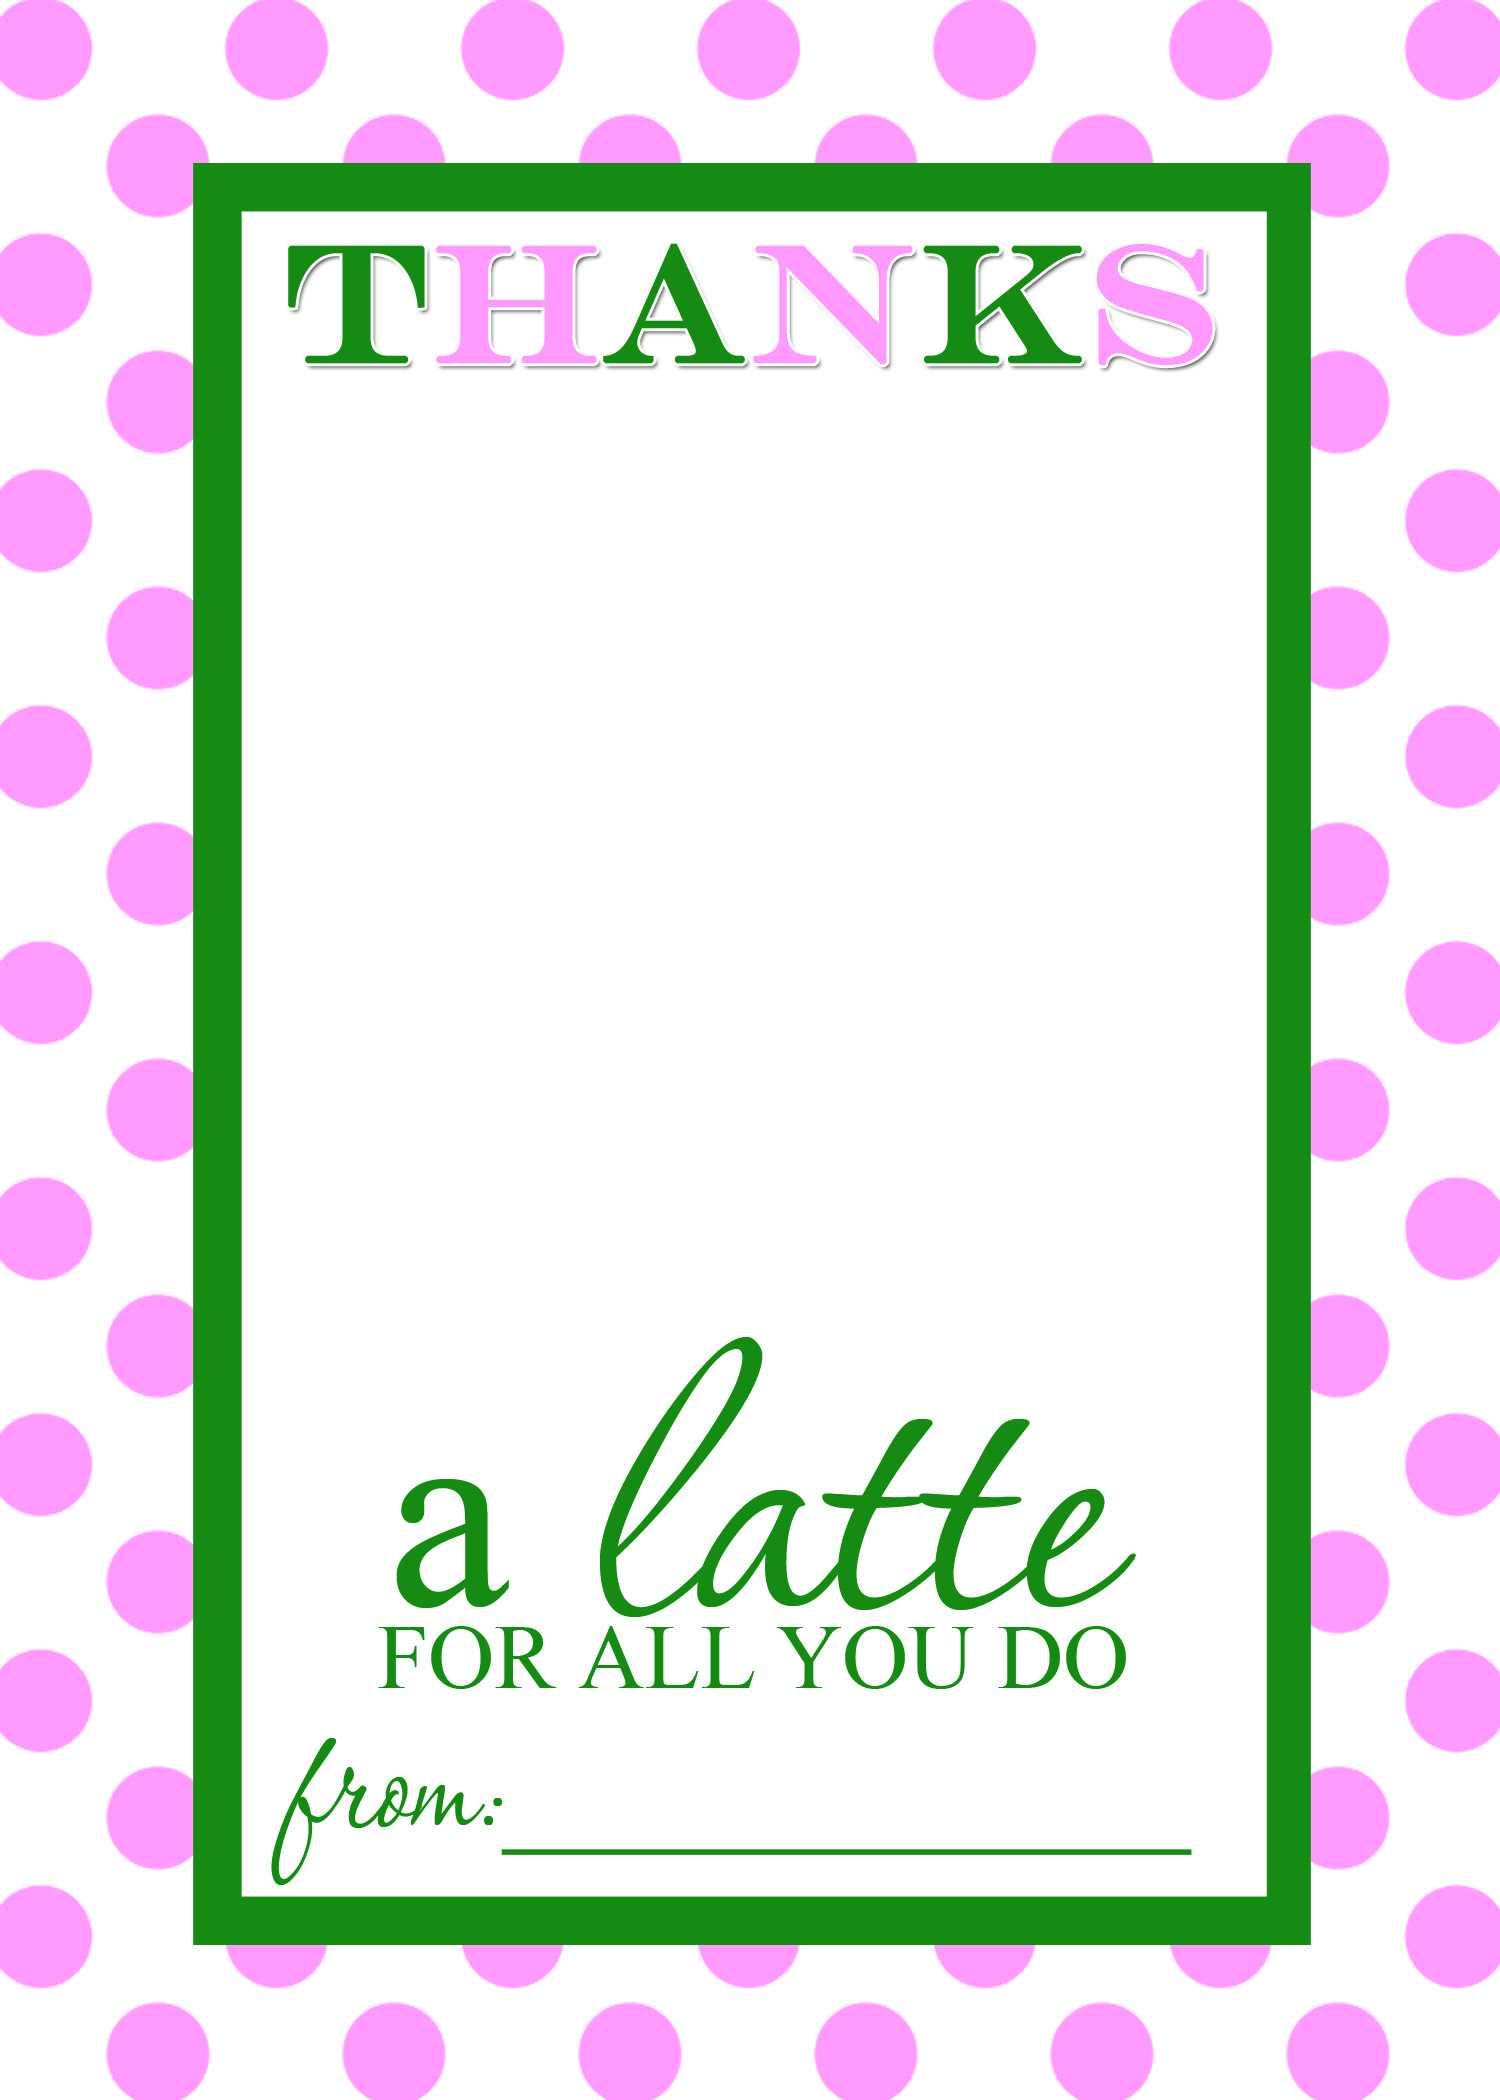 Thanks A Latte Free Printable Gift Card Holder Teacher Gift Inside Thanks A Latte Card Template